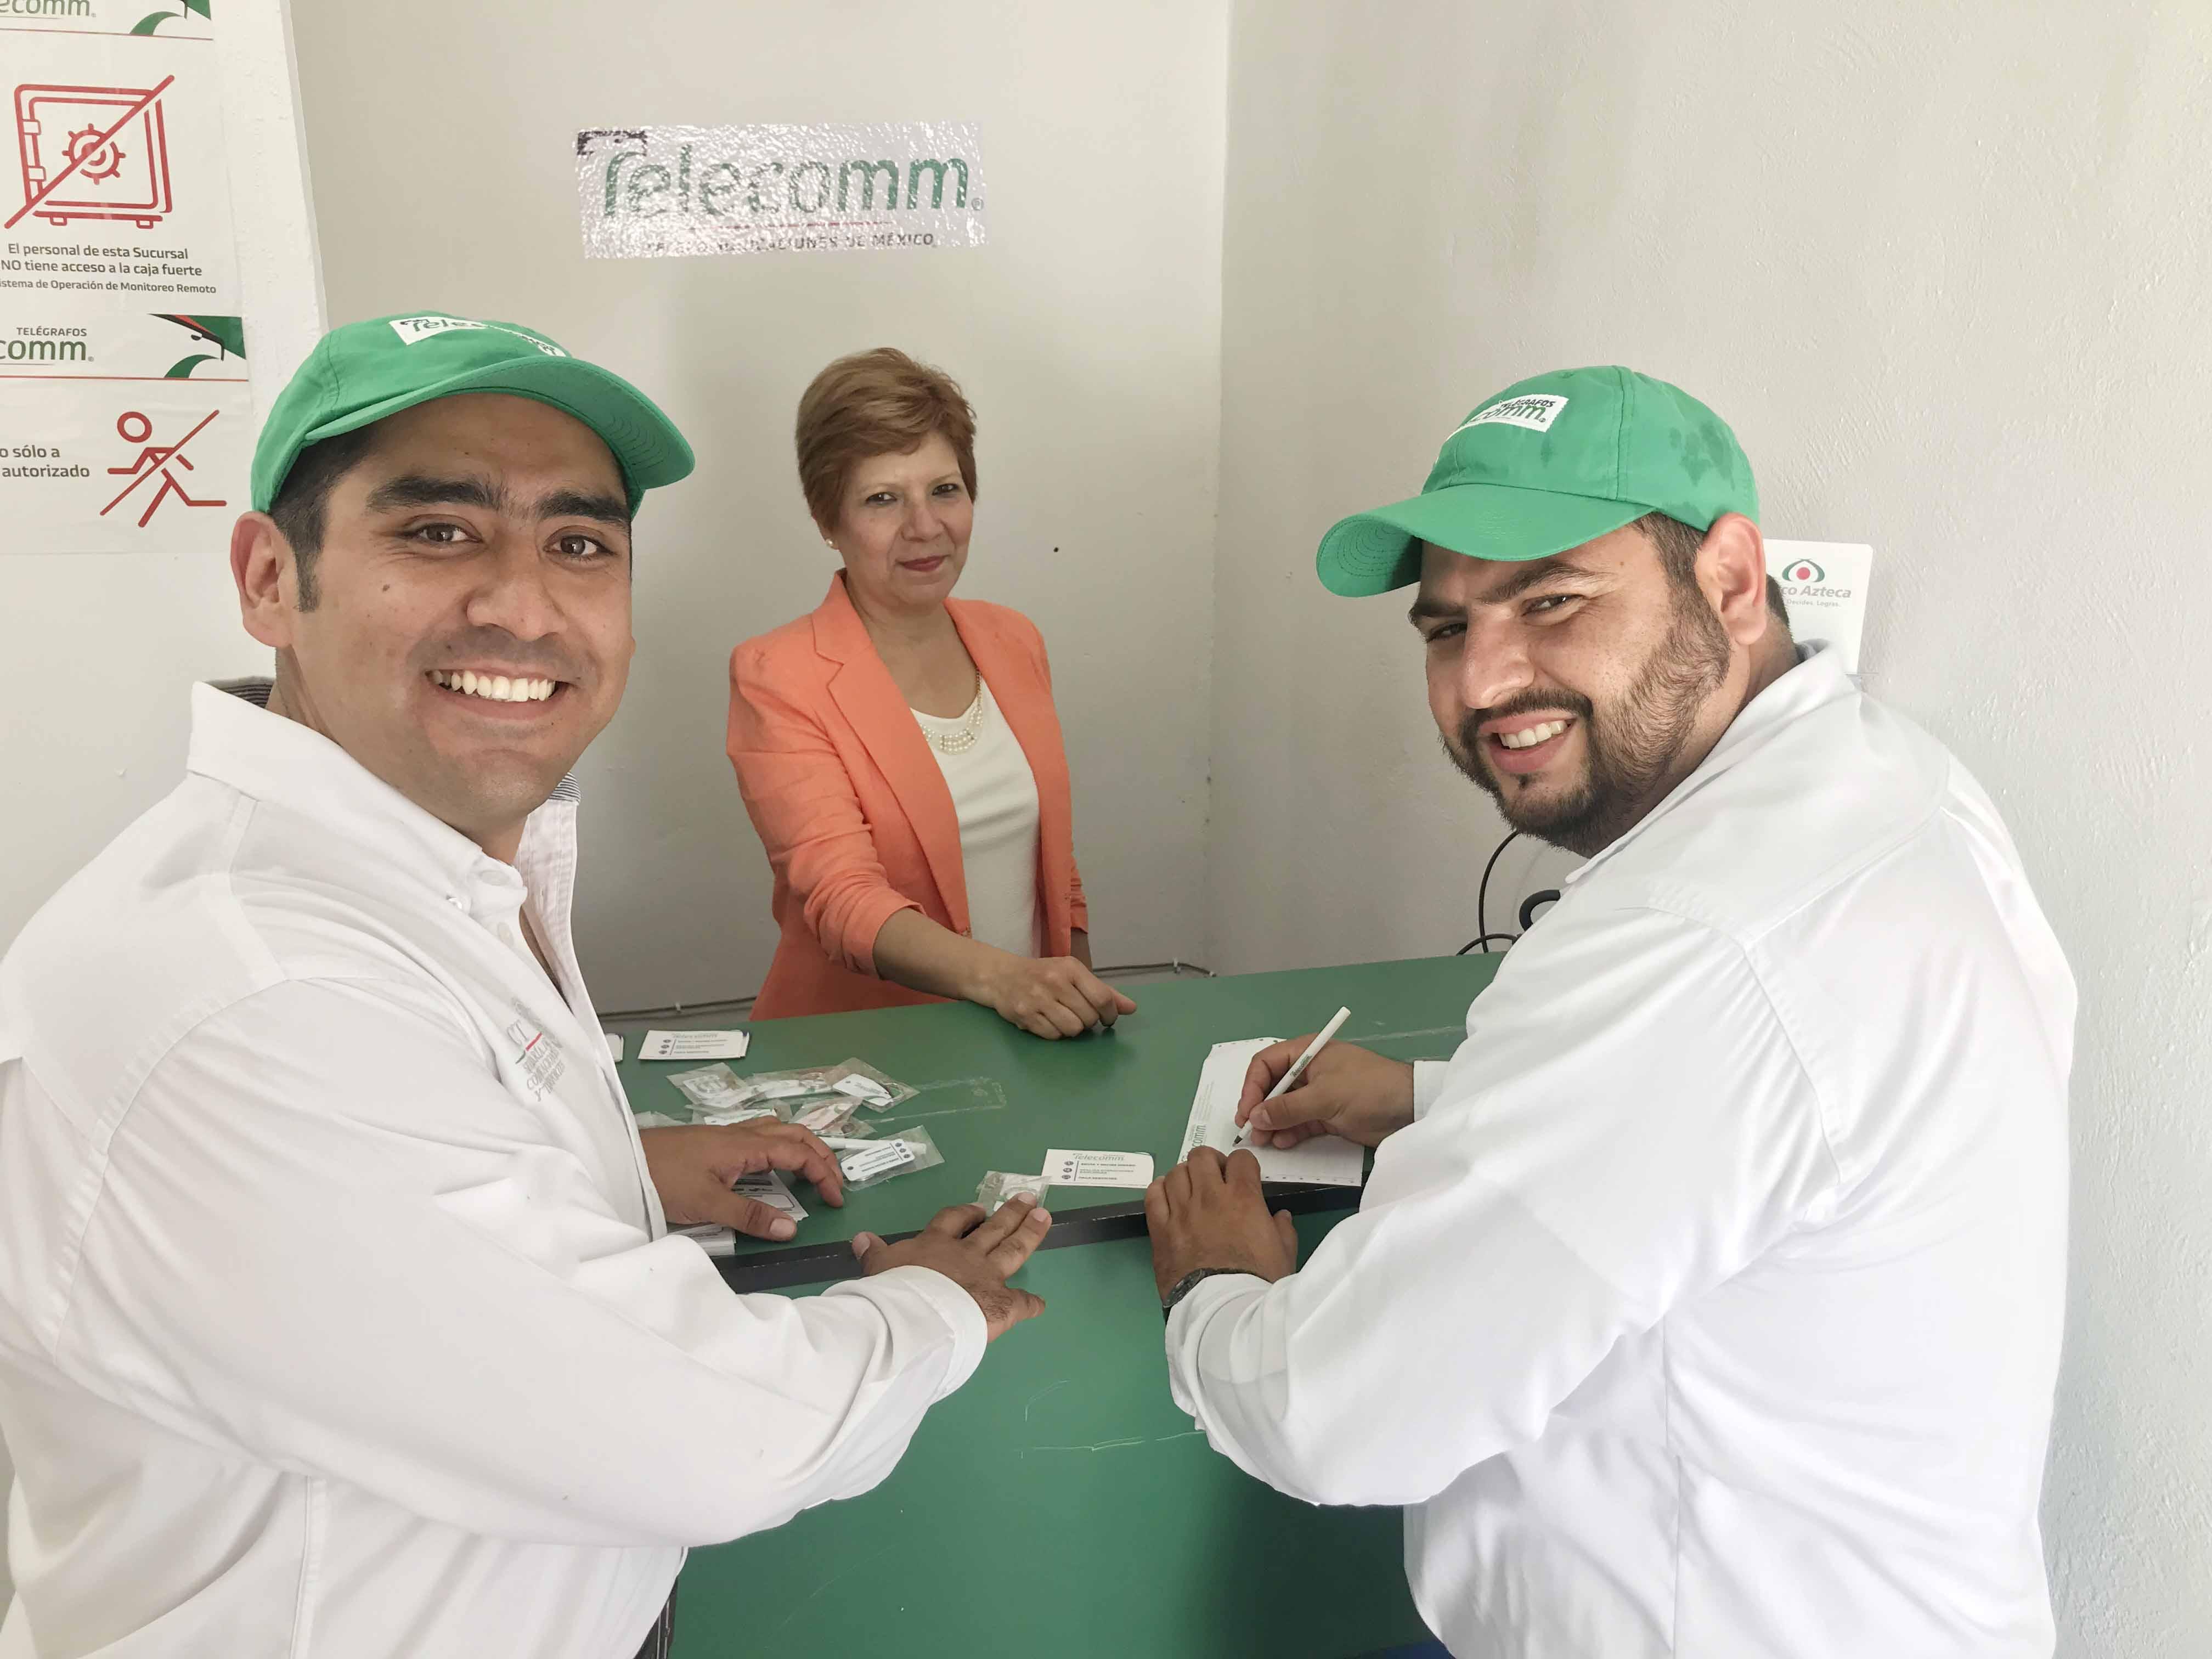 Telecomm inauguró la sucursal número 53 en el  estado de Coahuila